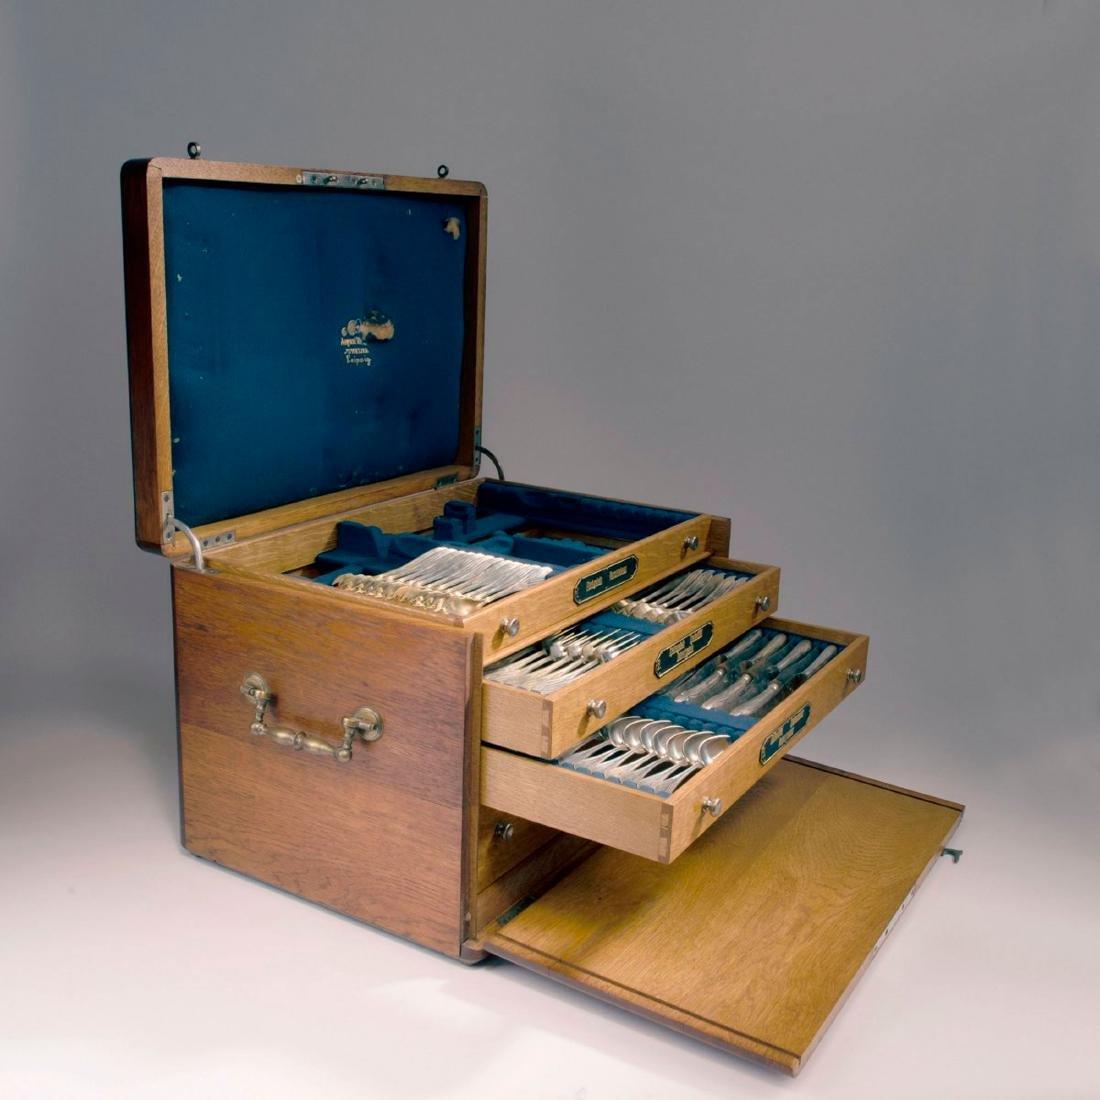 '3001' cutlery in original wooden box, 1901/02